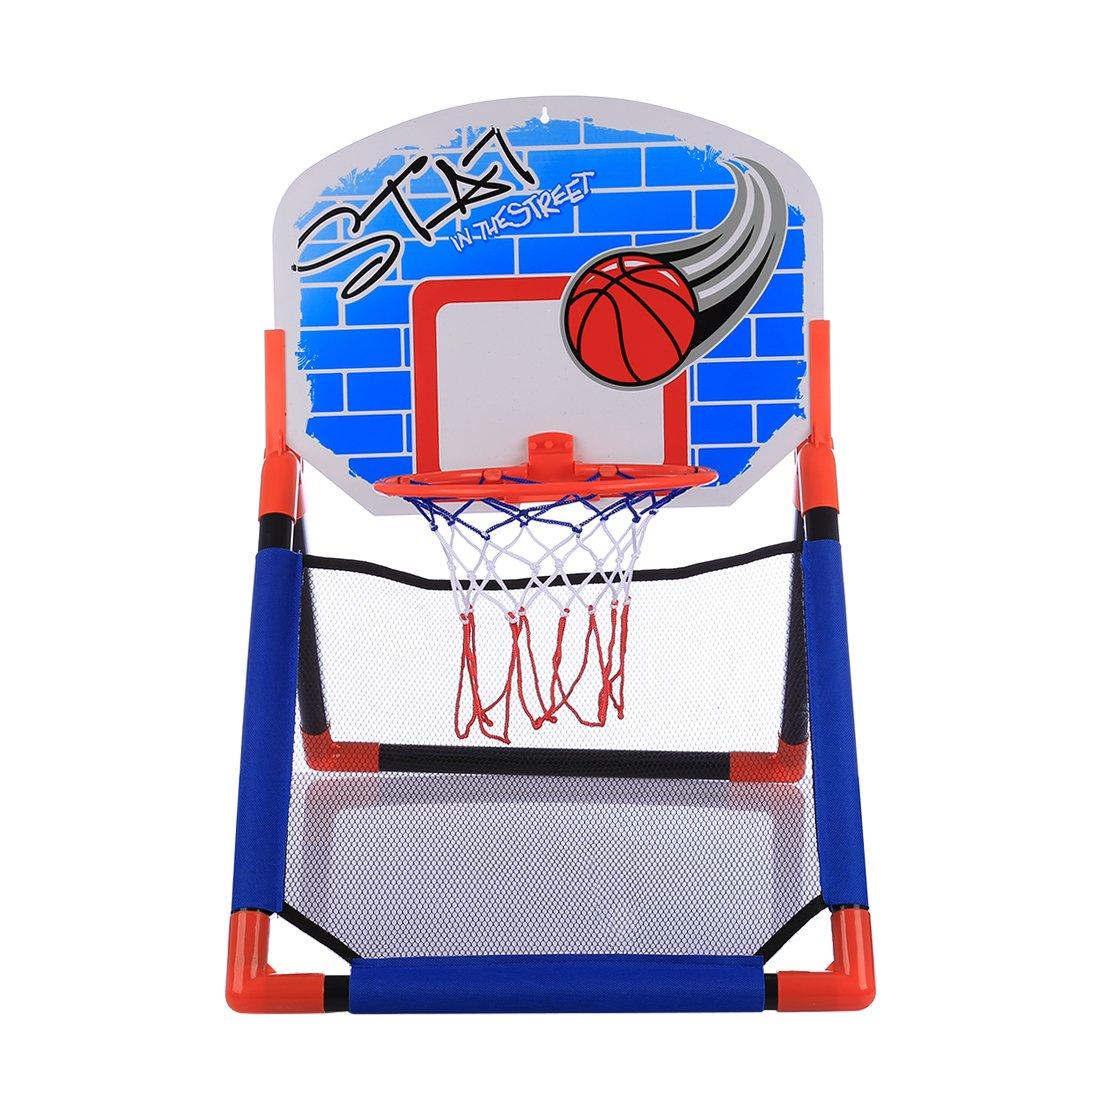 YxFlower Mini Canasta Infantil Baloncesto Ajustable para Ni/ños Juguetes Actividades de interiory por 3-9 a/ños,65x46x44cm